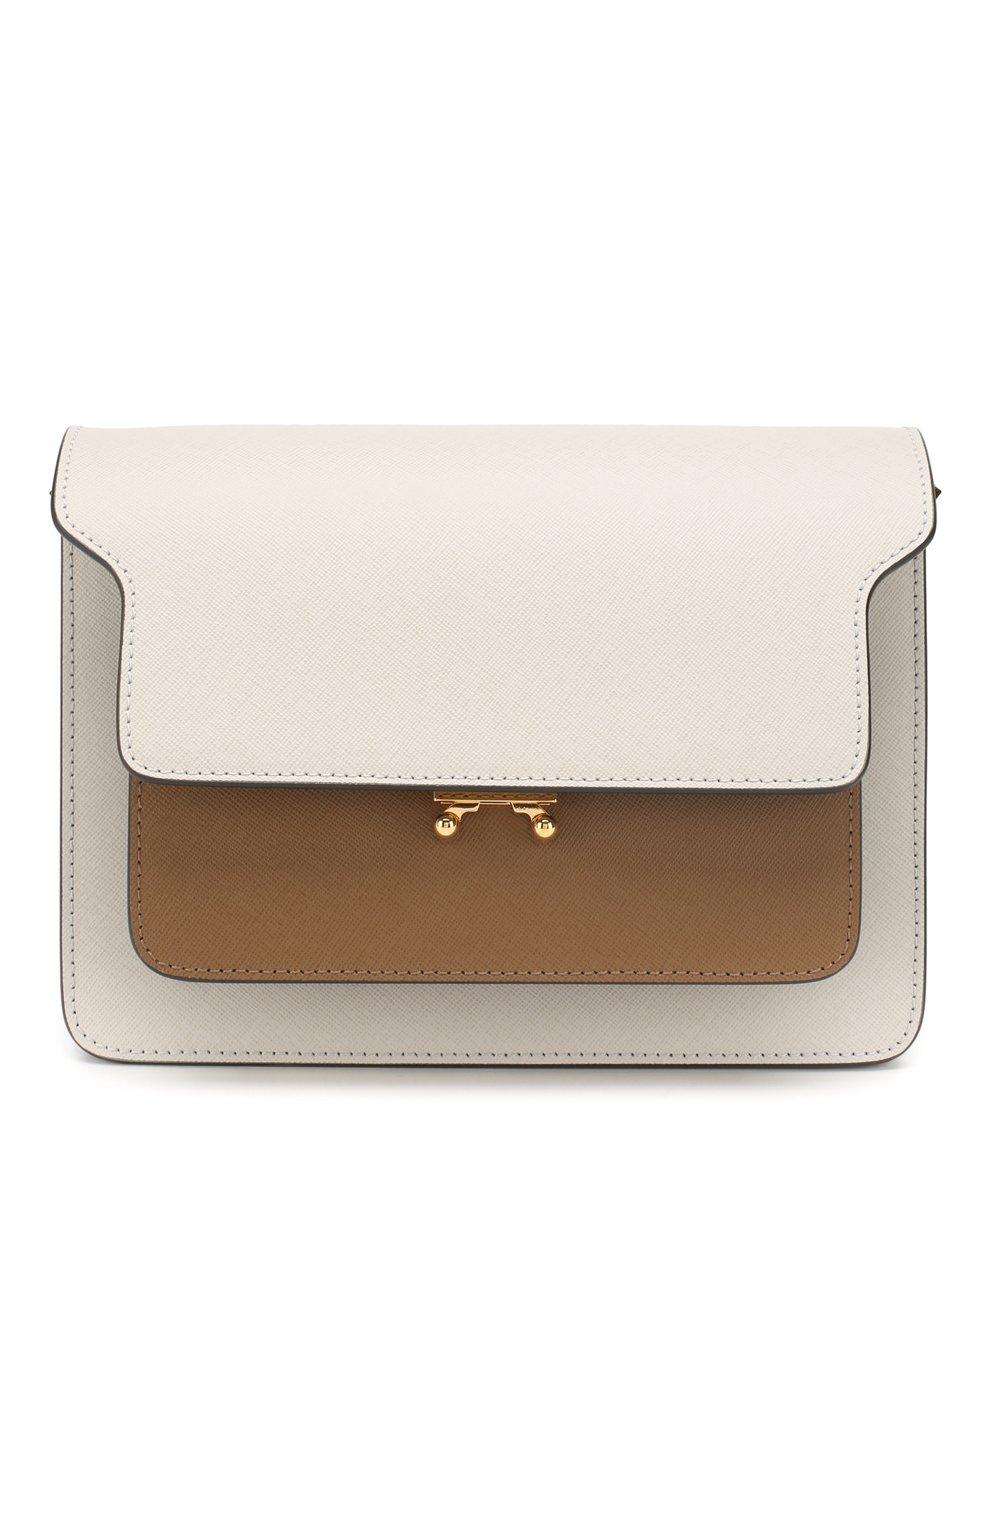 Женская сумка trunk MARNI белого цвета, арт. SBMPN09N05/LV520   Фото 1 (Сумки-технические: Сумки top-handle; Материал: Натуральная кожа; Ремень/цепочка: На ремешке; Размер: small; Статус проверки: Проверена категория)